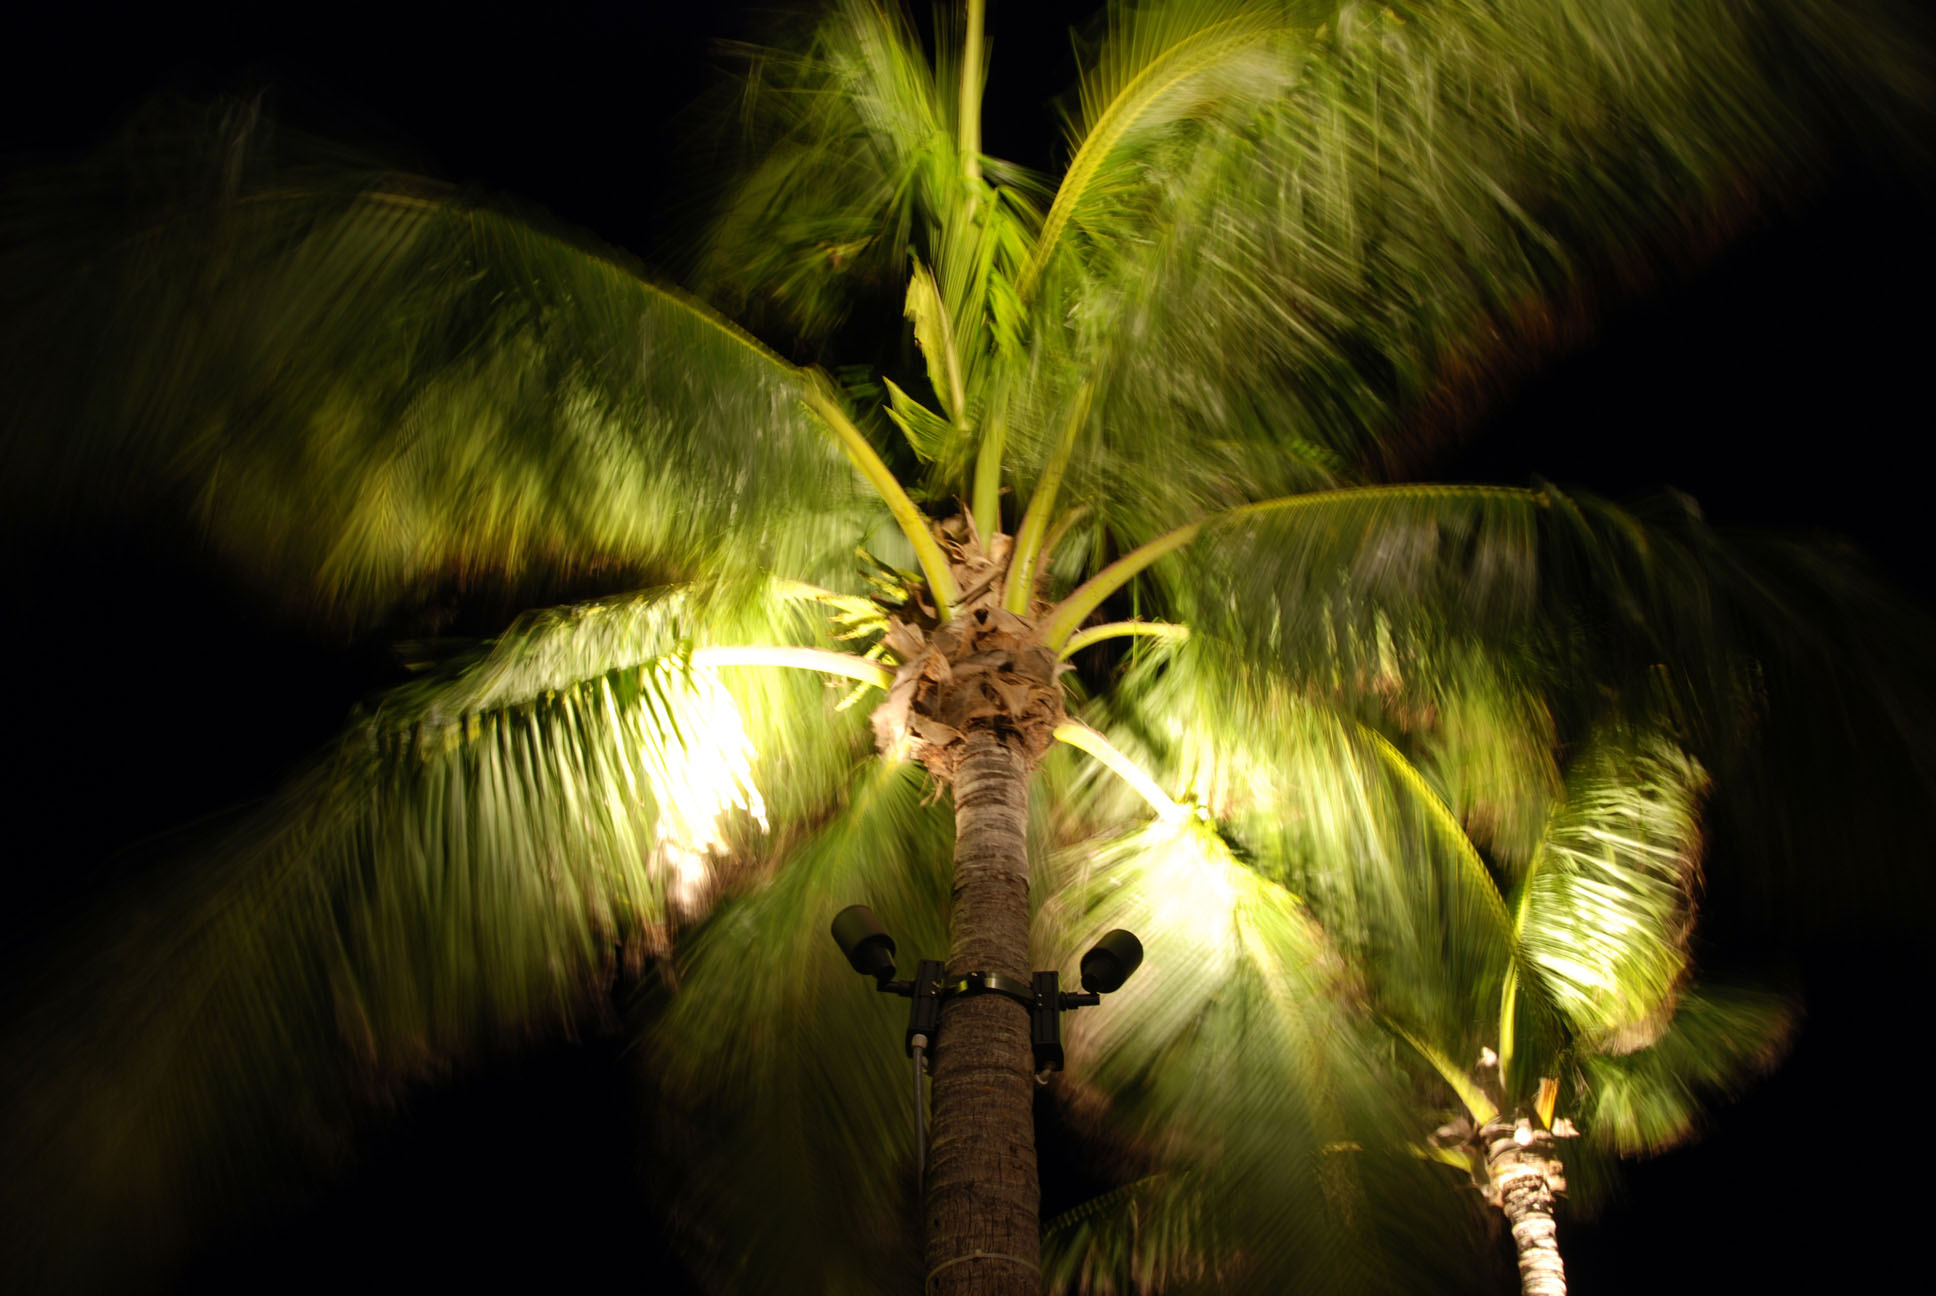 Palm in the wind, islamorada, florida photo